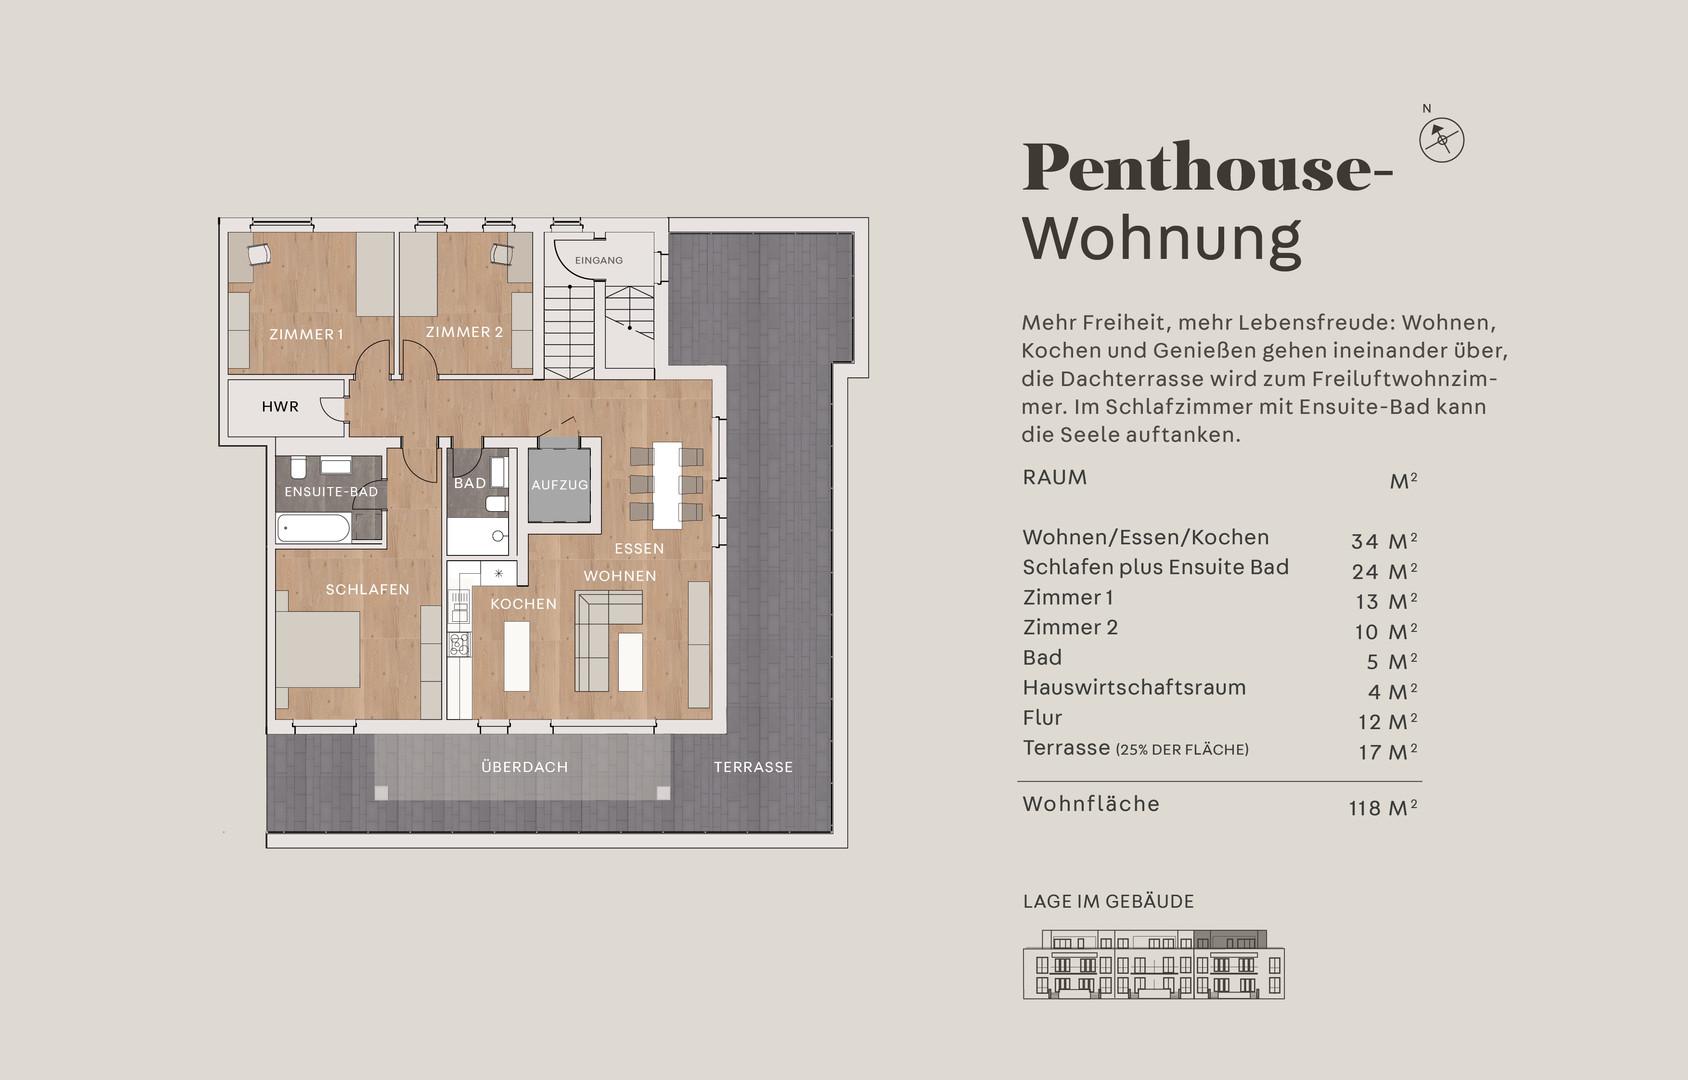 190603_gruengrut_Website_Grundrisse.jpg